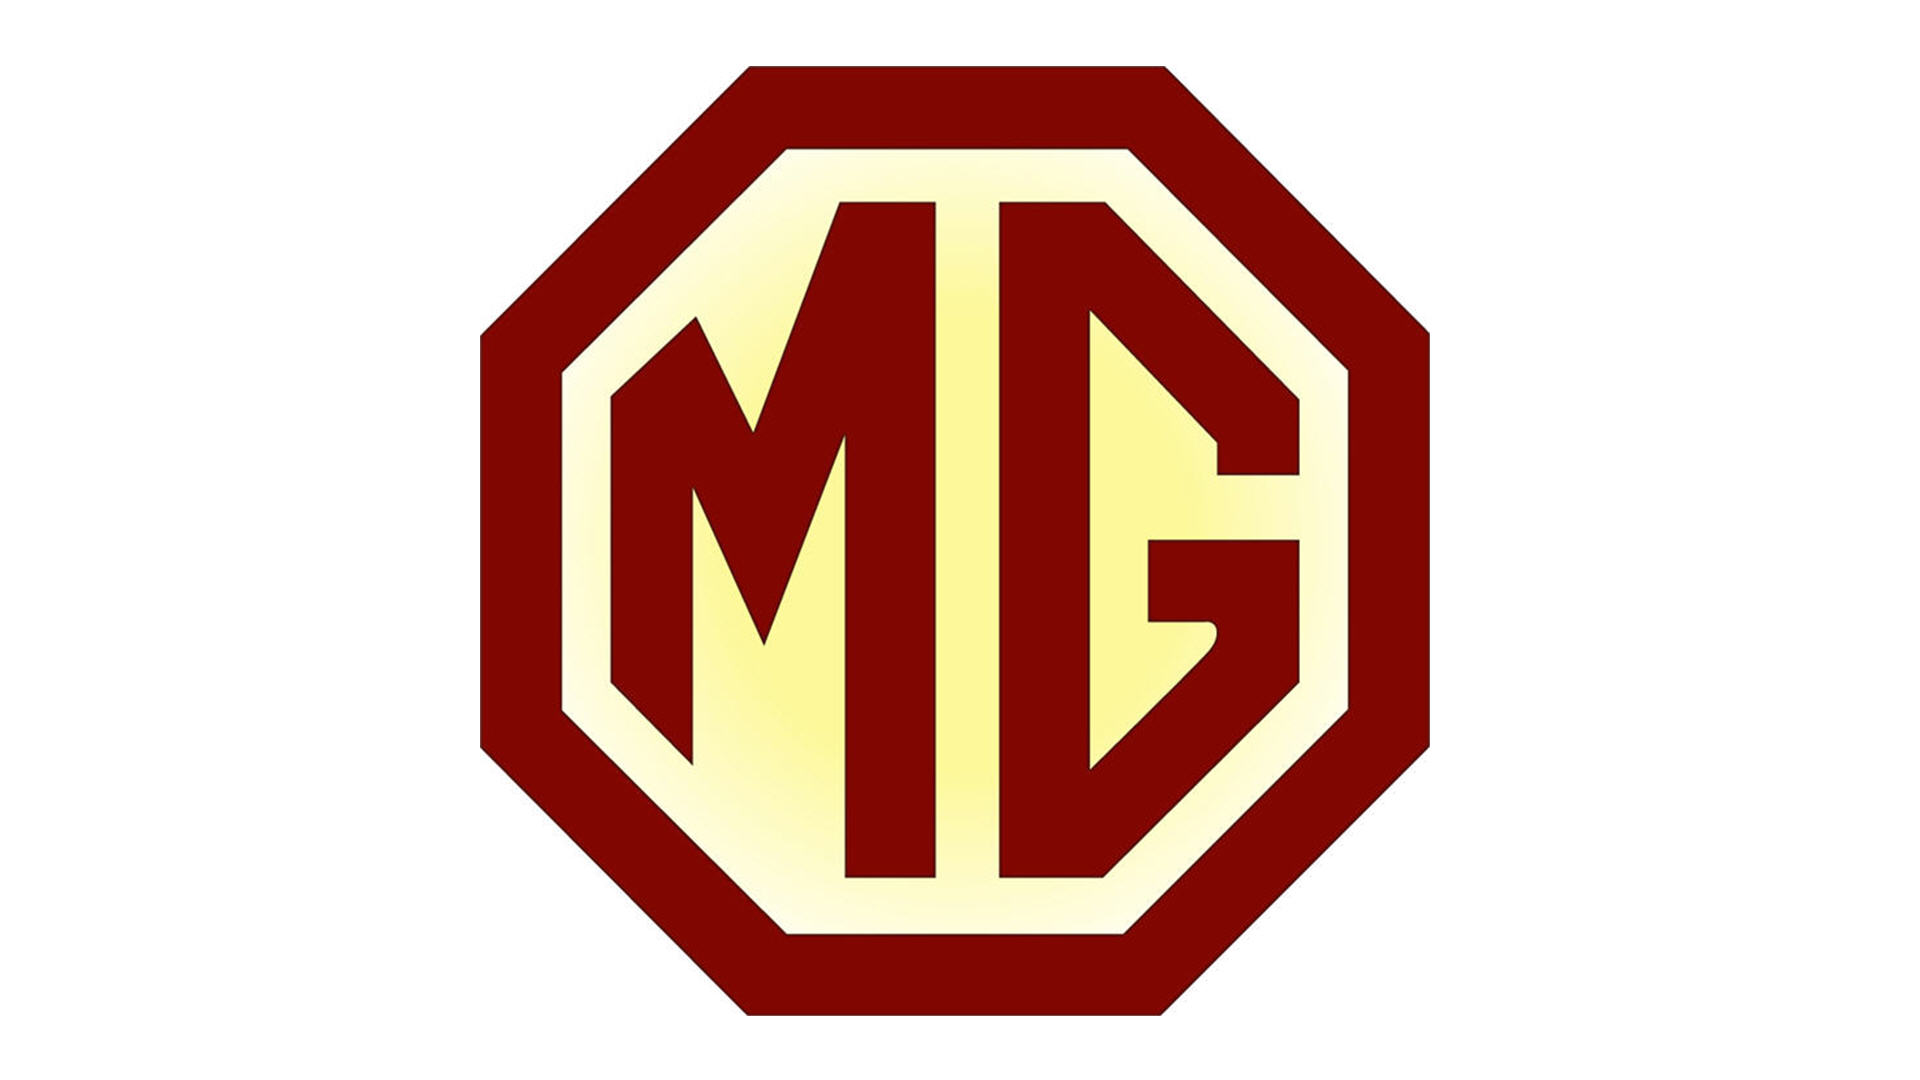 Related search Mg Logo 1920x1080 Car logos 1920x1080